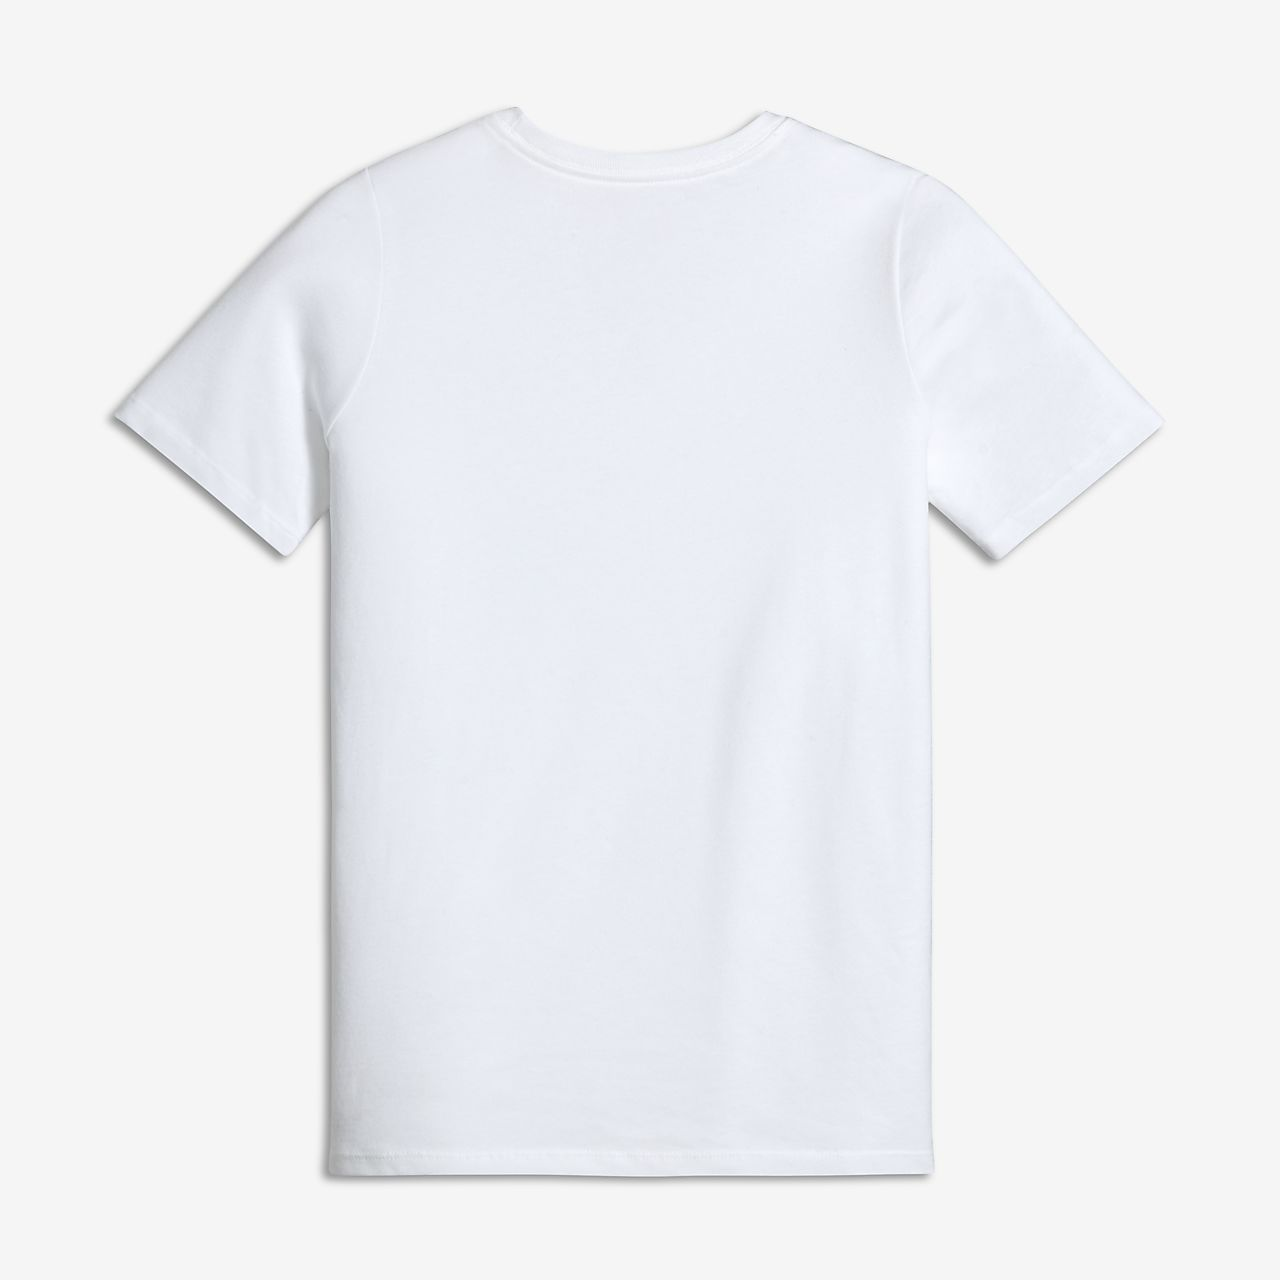 T shirt white south park t shirts for Nike custom t shirts